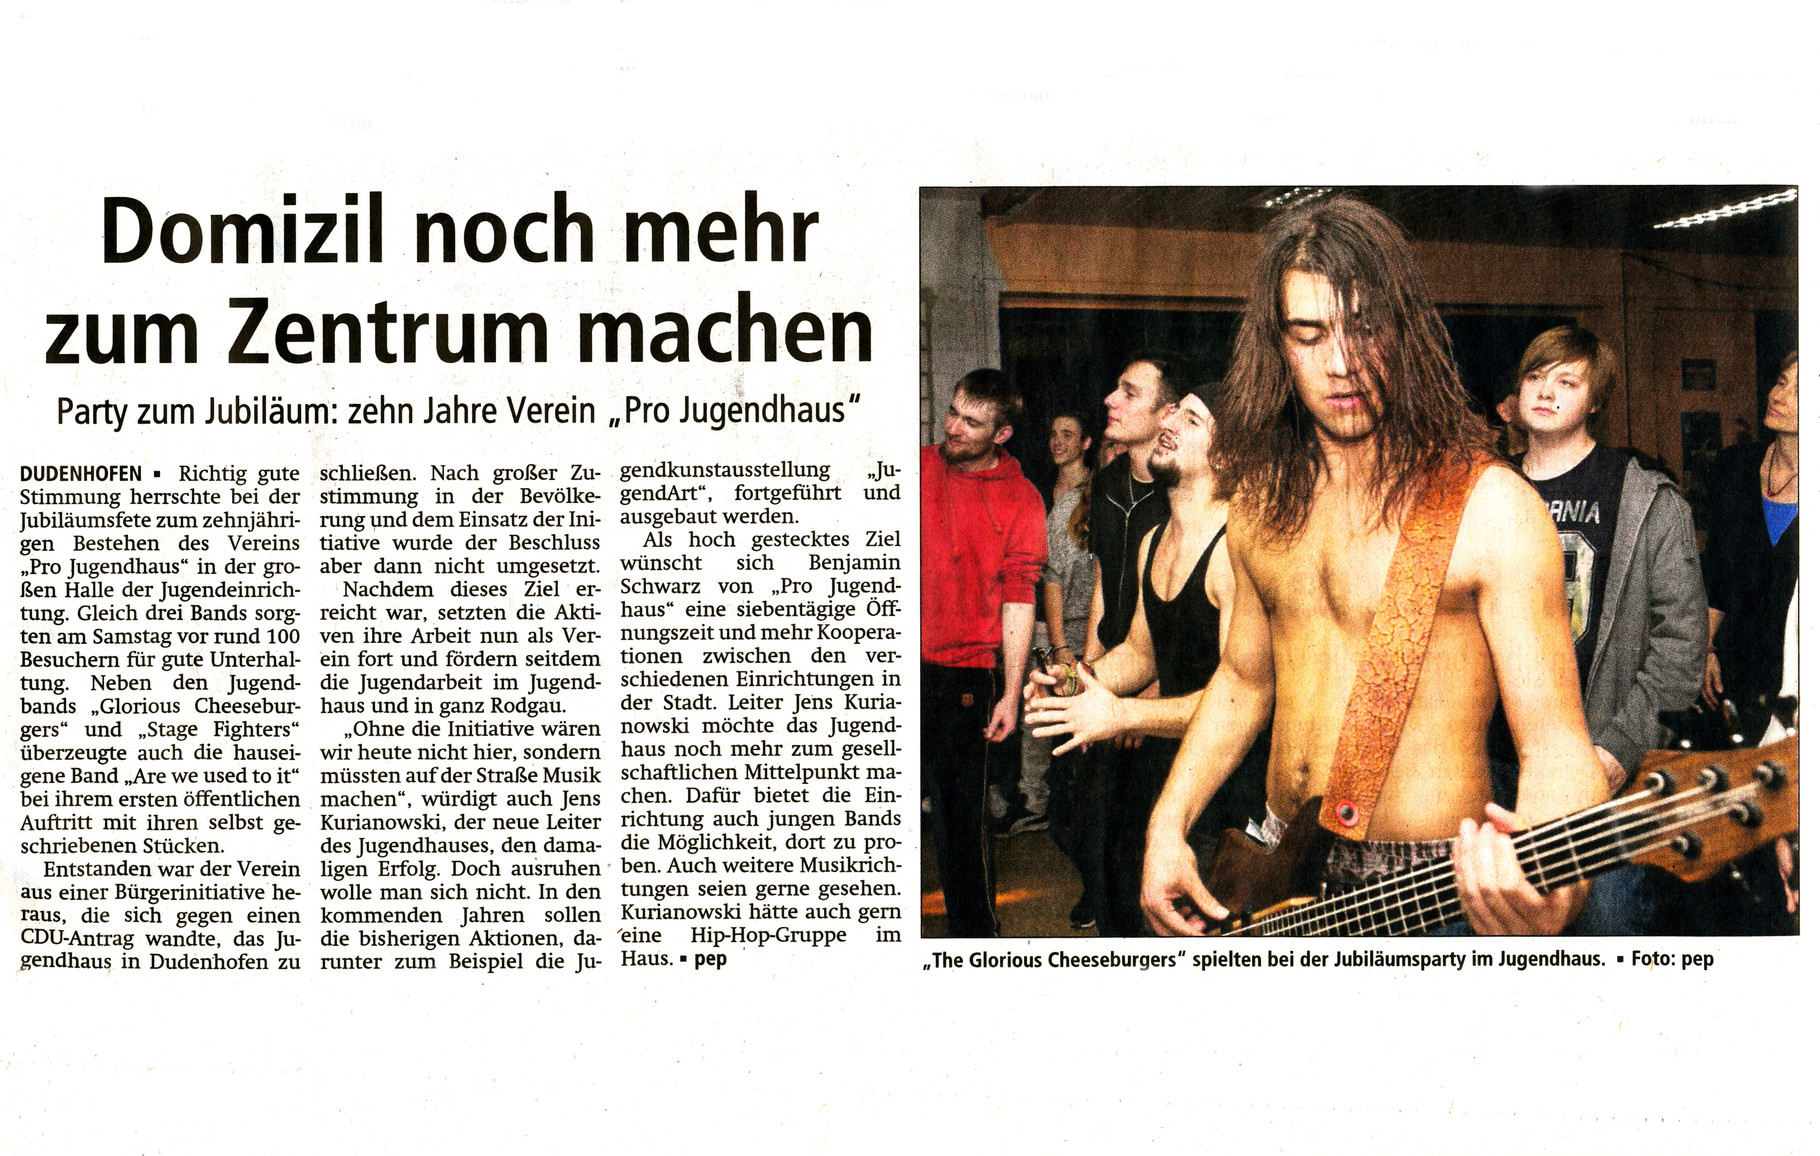 Offenbach Post, 19. November 2014